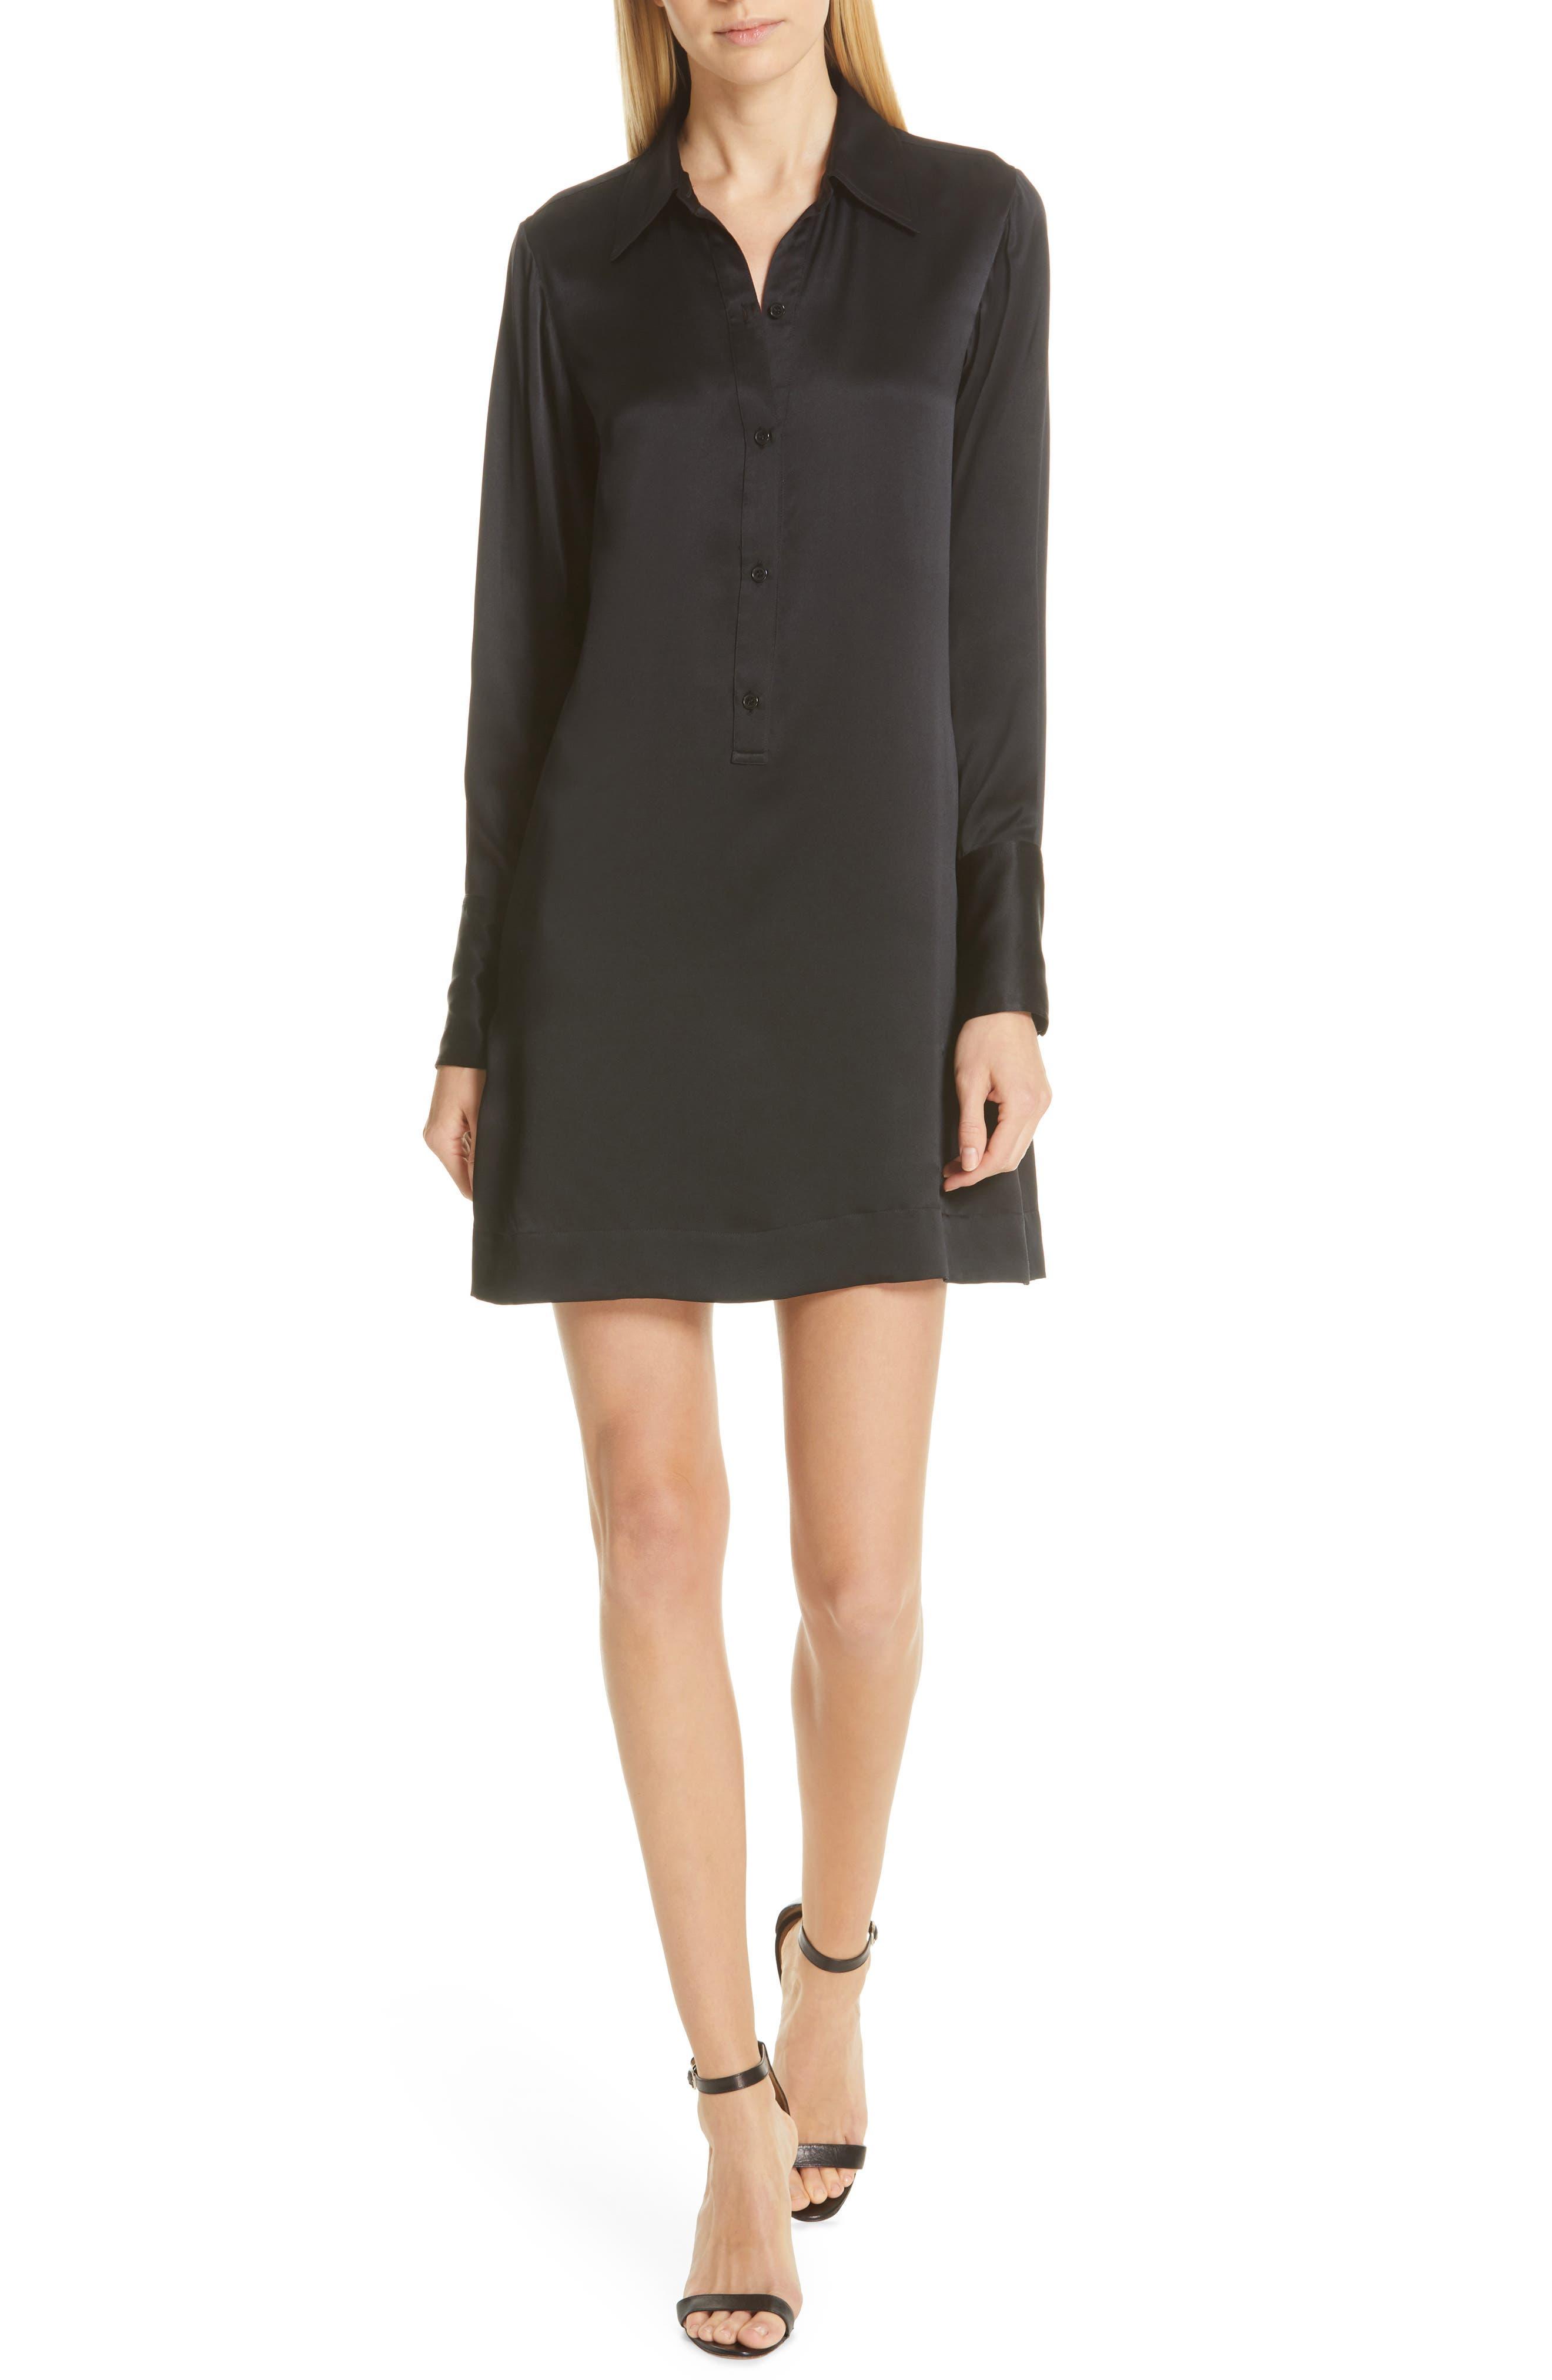 NILI LOTAN, Cassidy Silk Shirtdress, Main thumbnail 1, color, BLACK